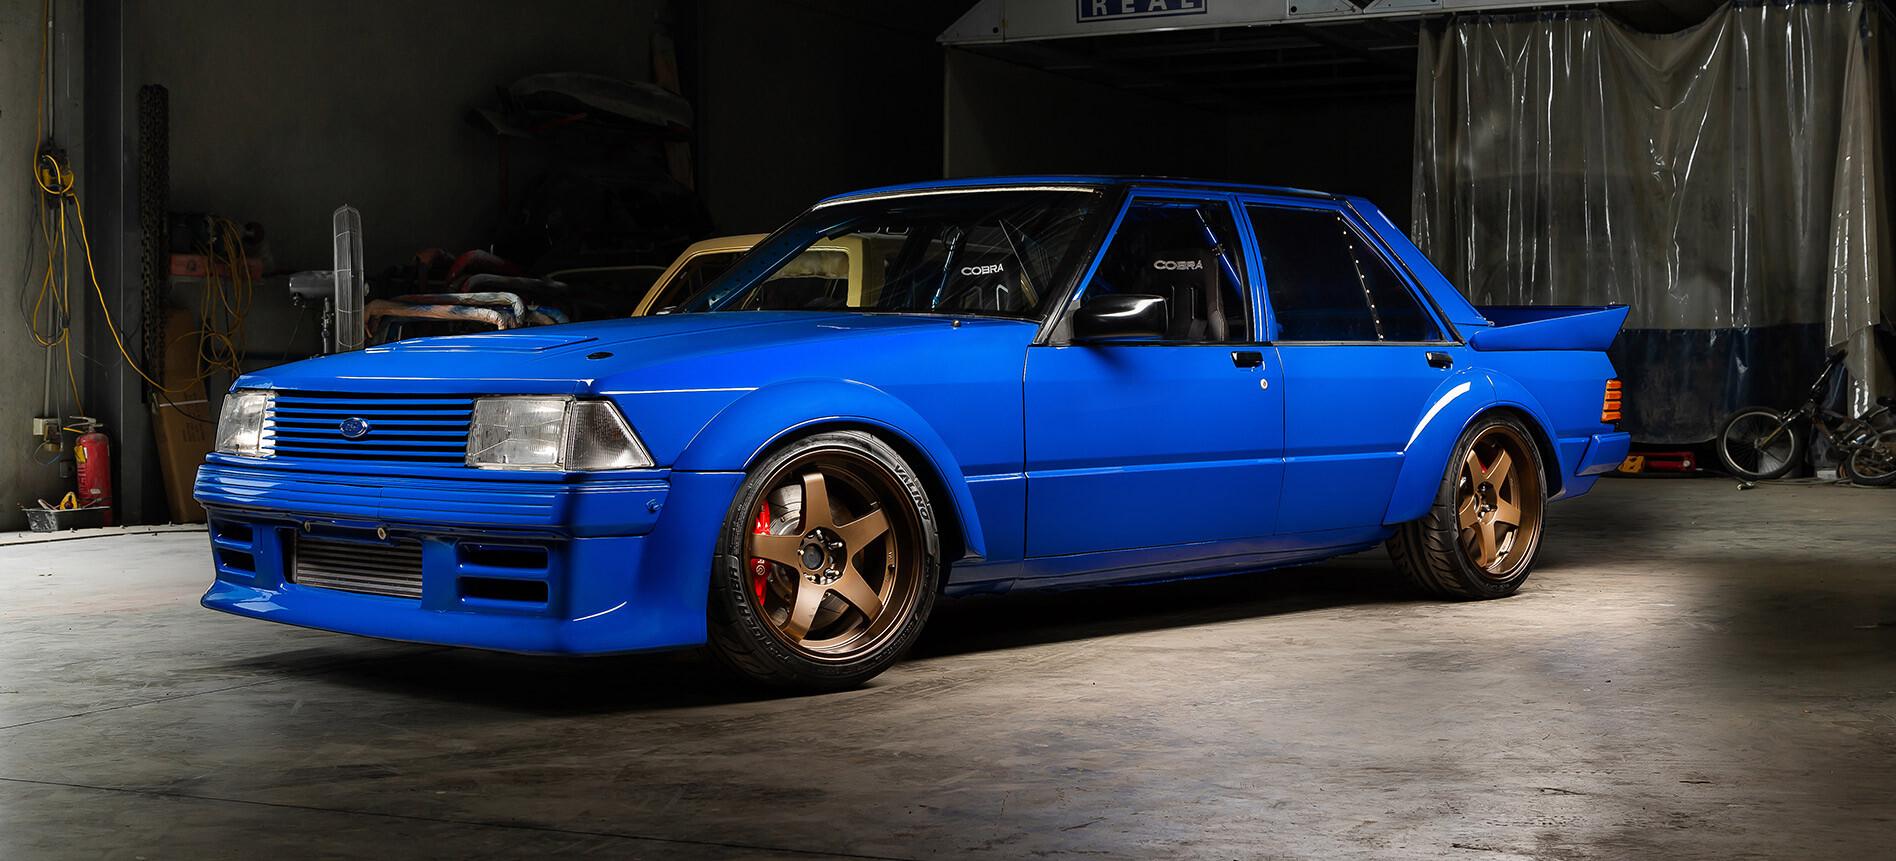 Ford Falcon XD